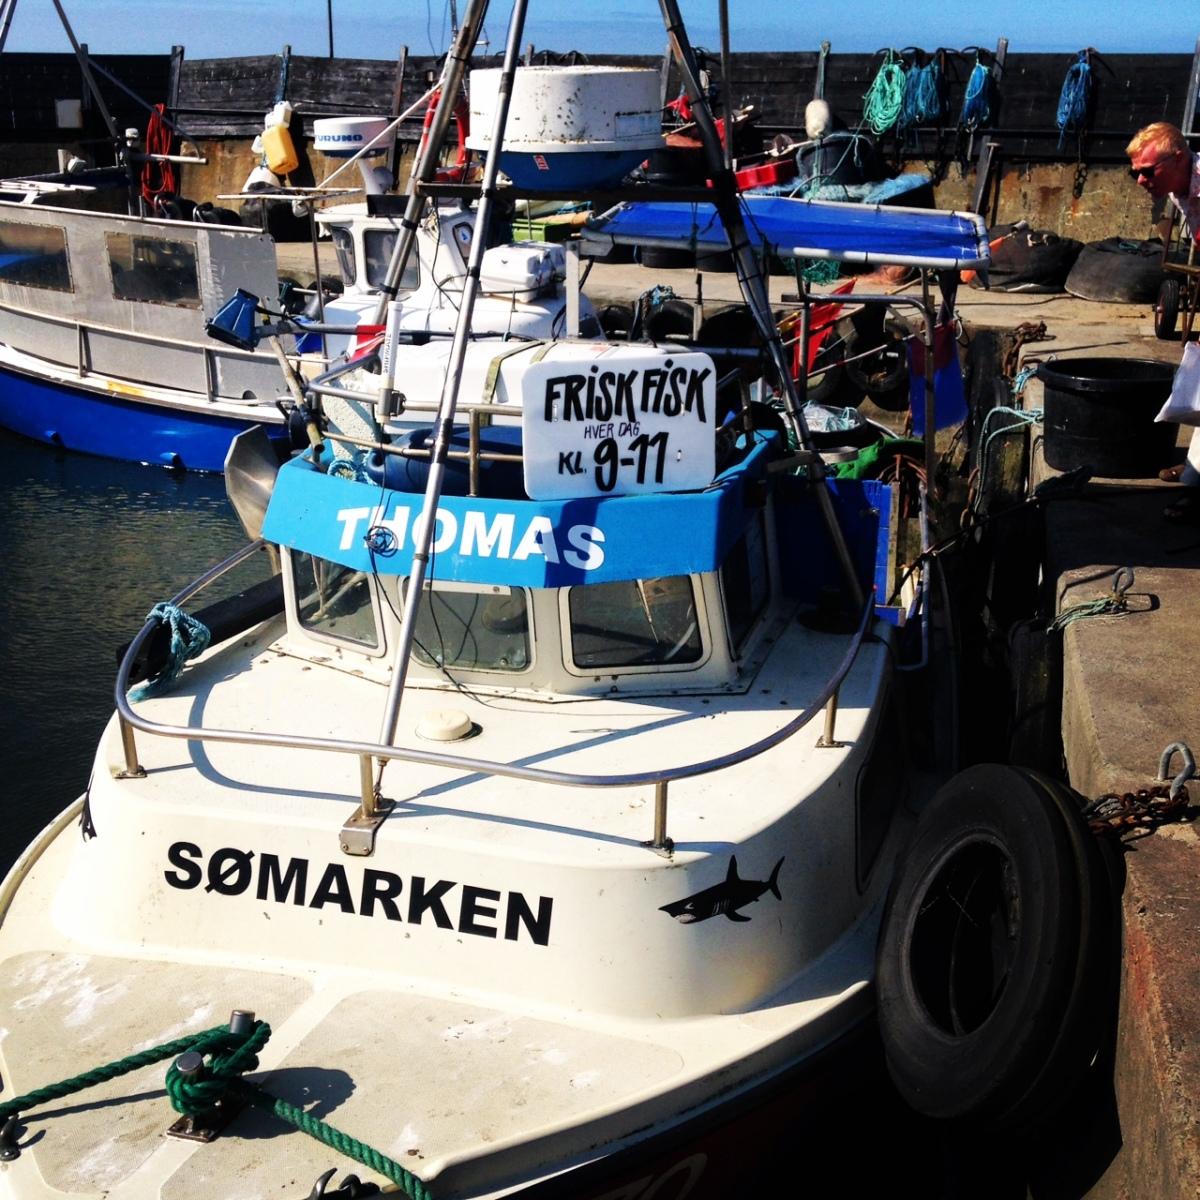 Fangfrisch ins Ferienhaus: Frischer Fisch direkt vom Kutter!